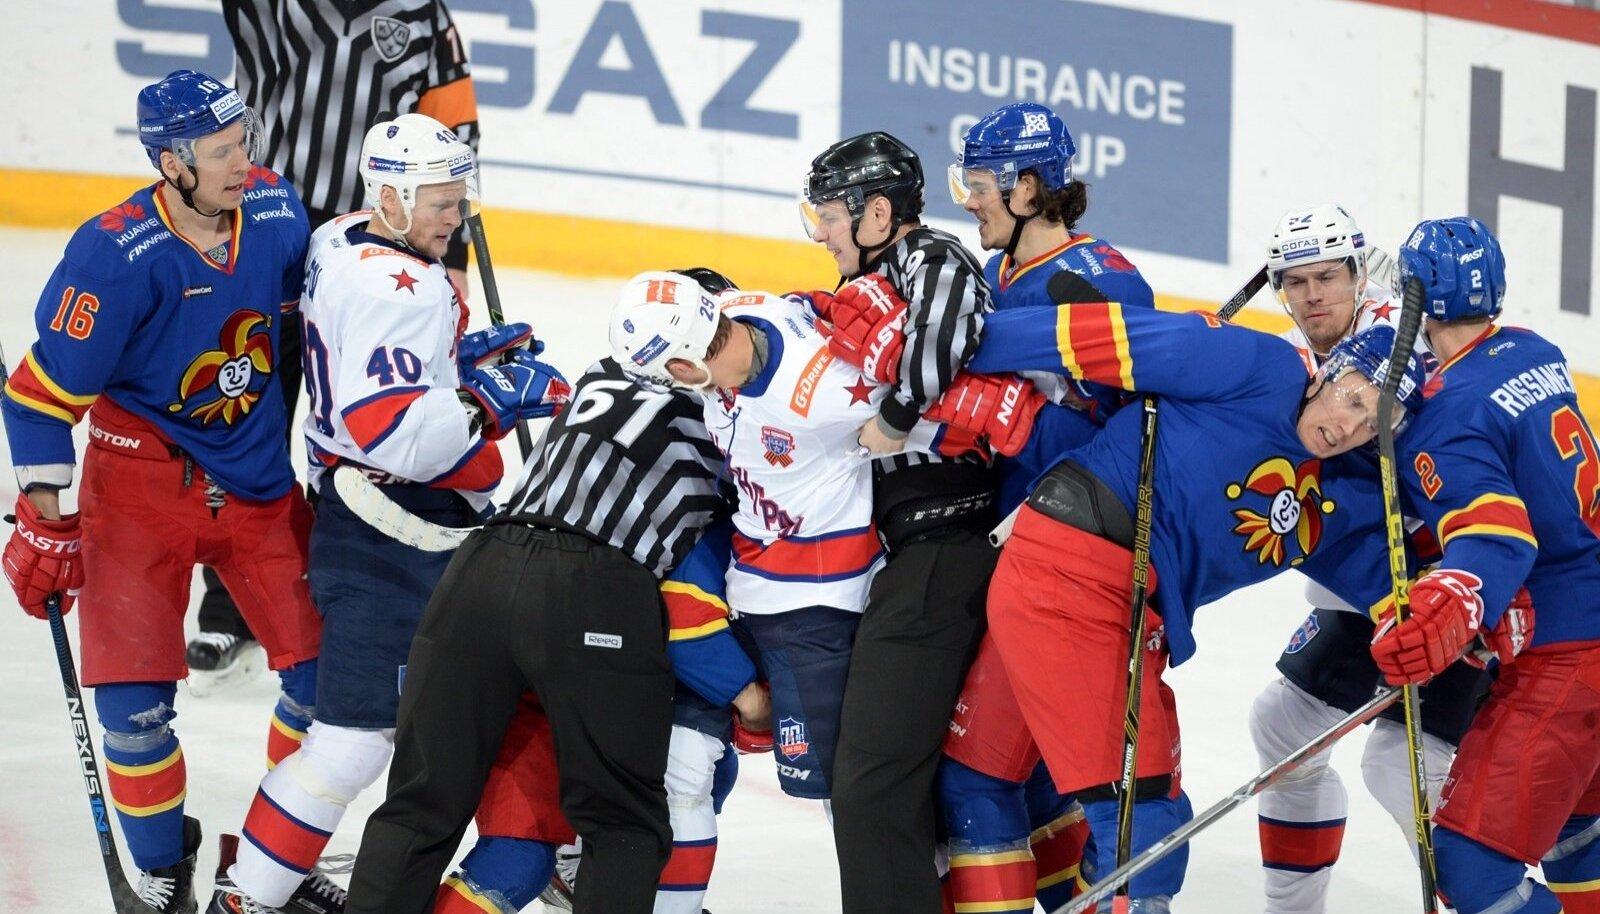 KHL Game between Jokerit and SKA